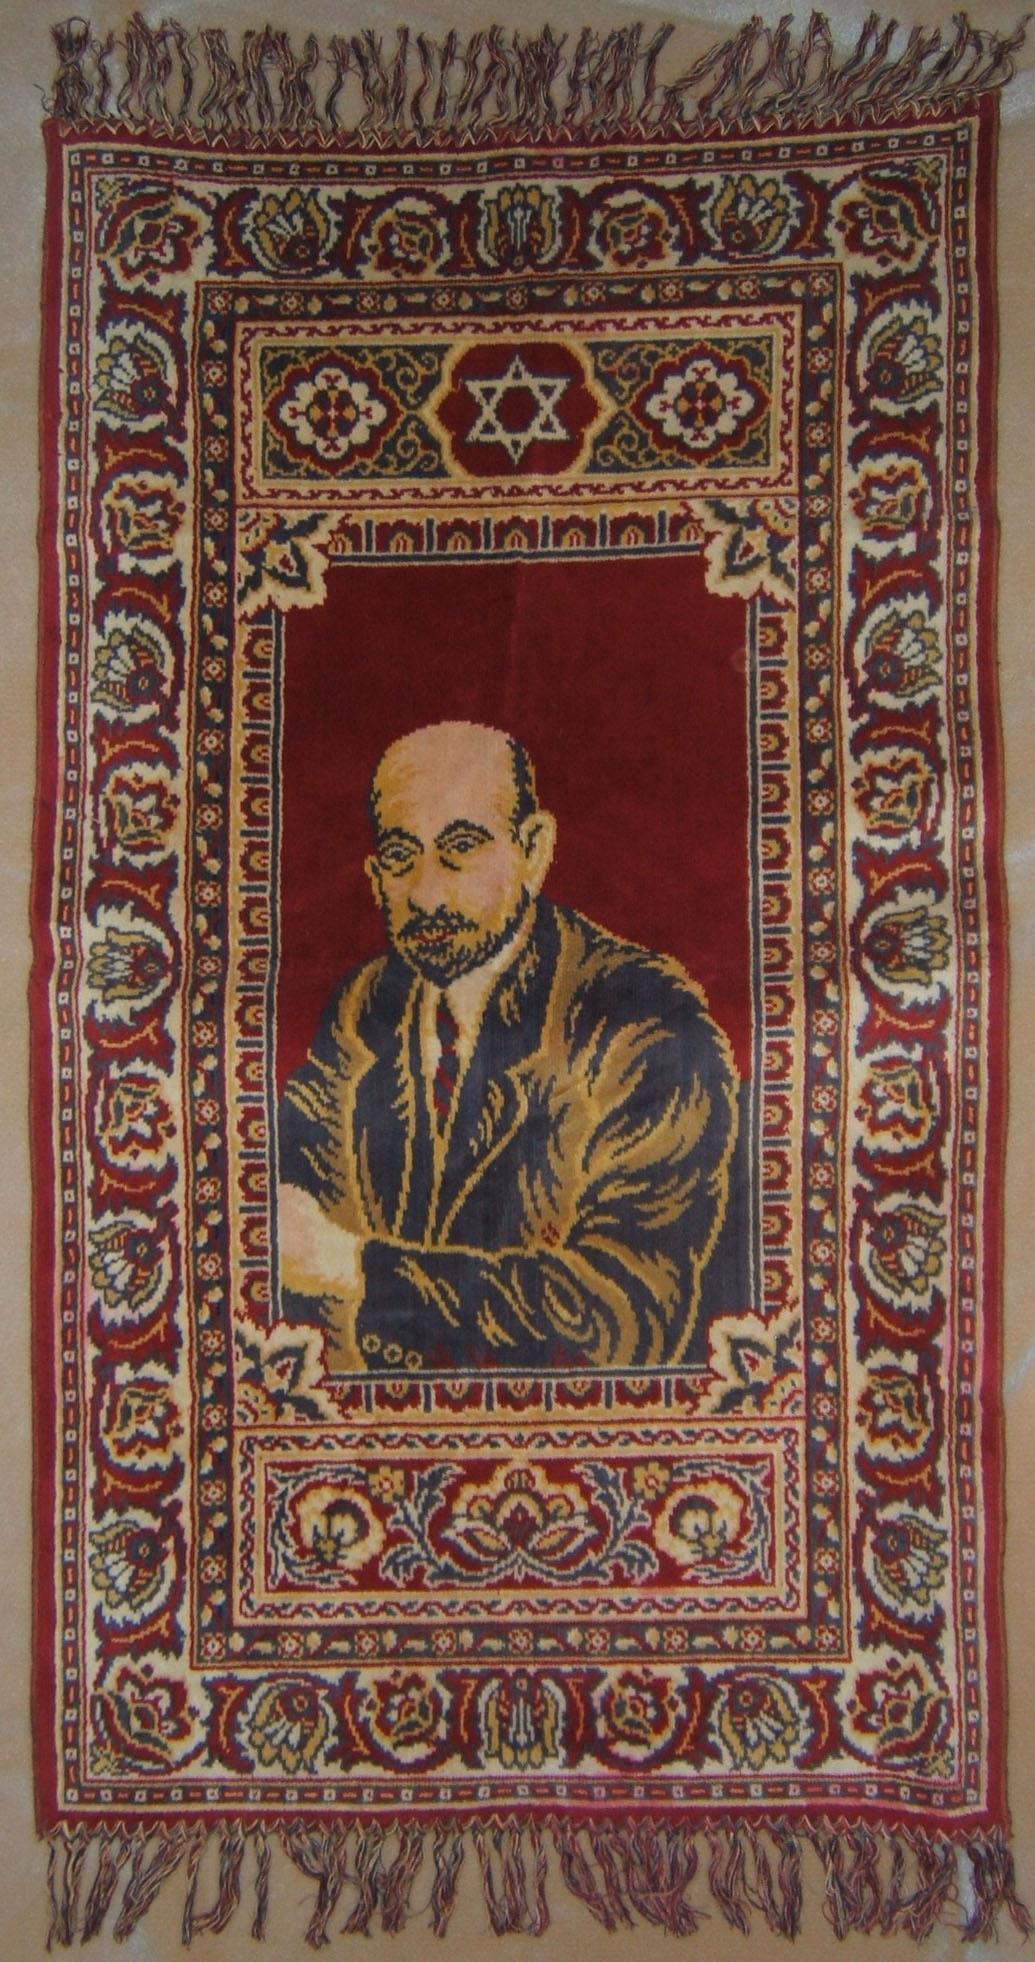 Palestine/E.I. Chaim Weizmann Zionist weave, circa. 1917-1920/31